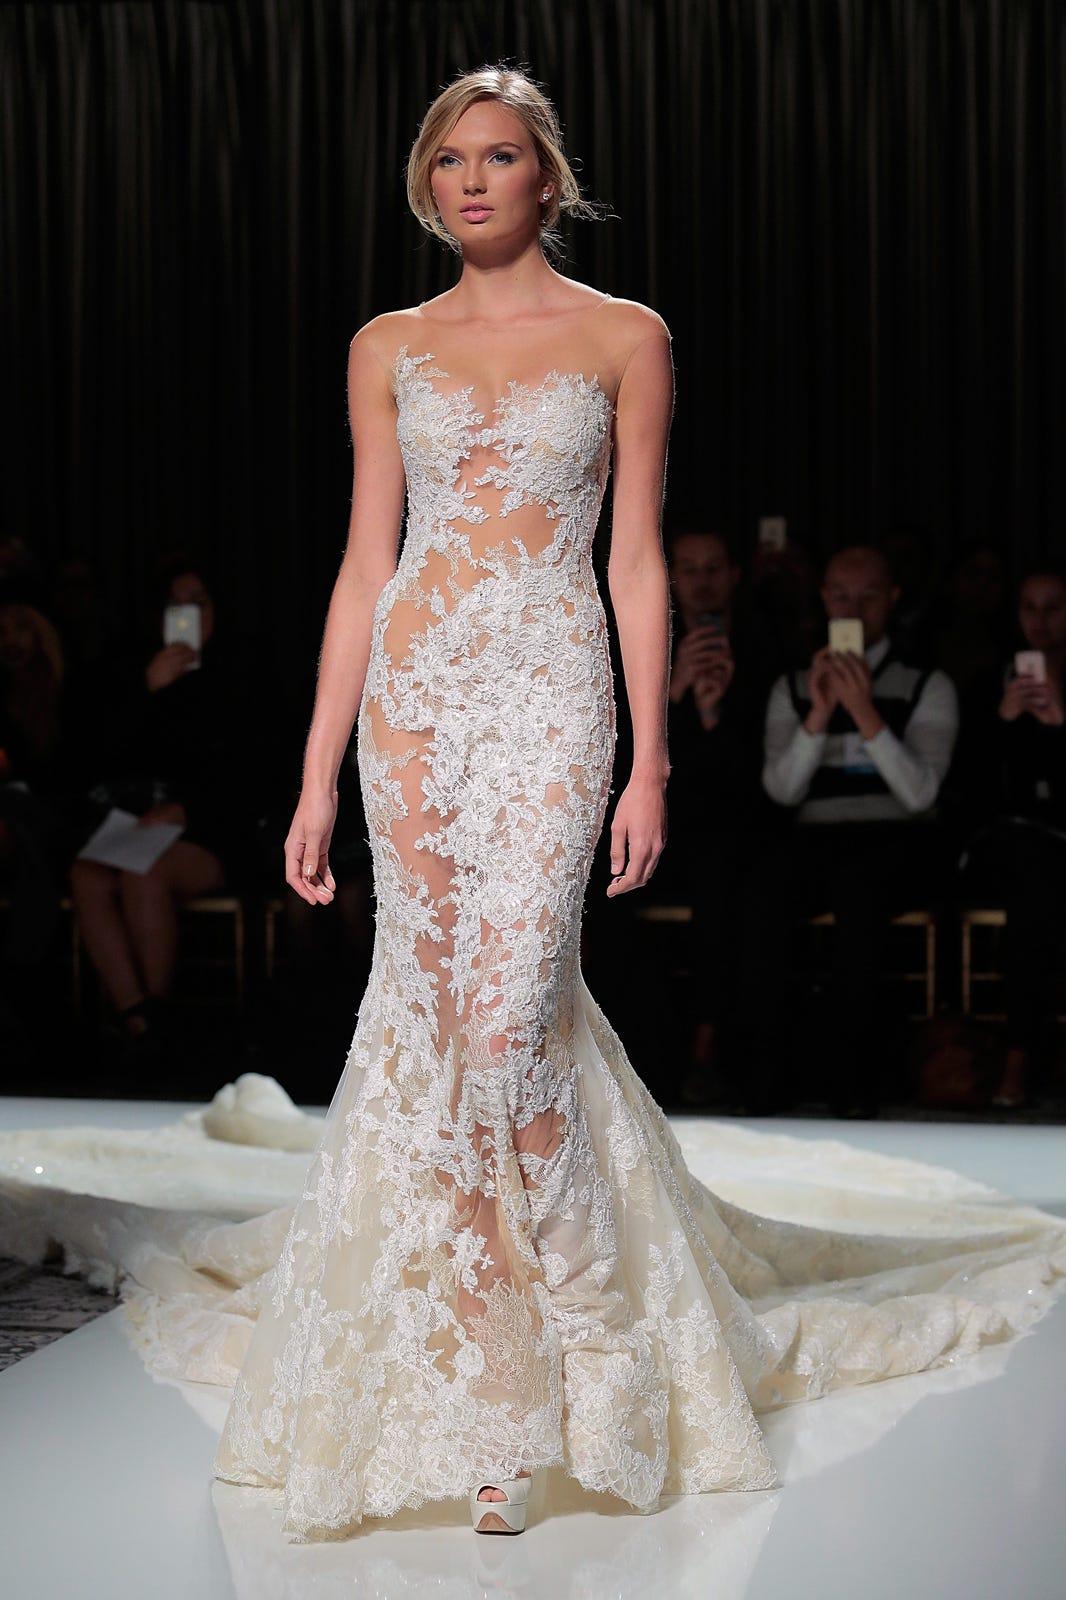 Wedding Dress History - Trends